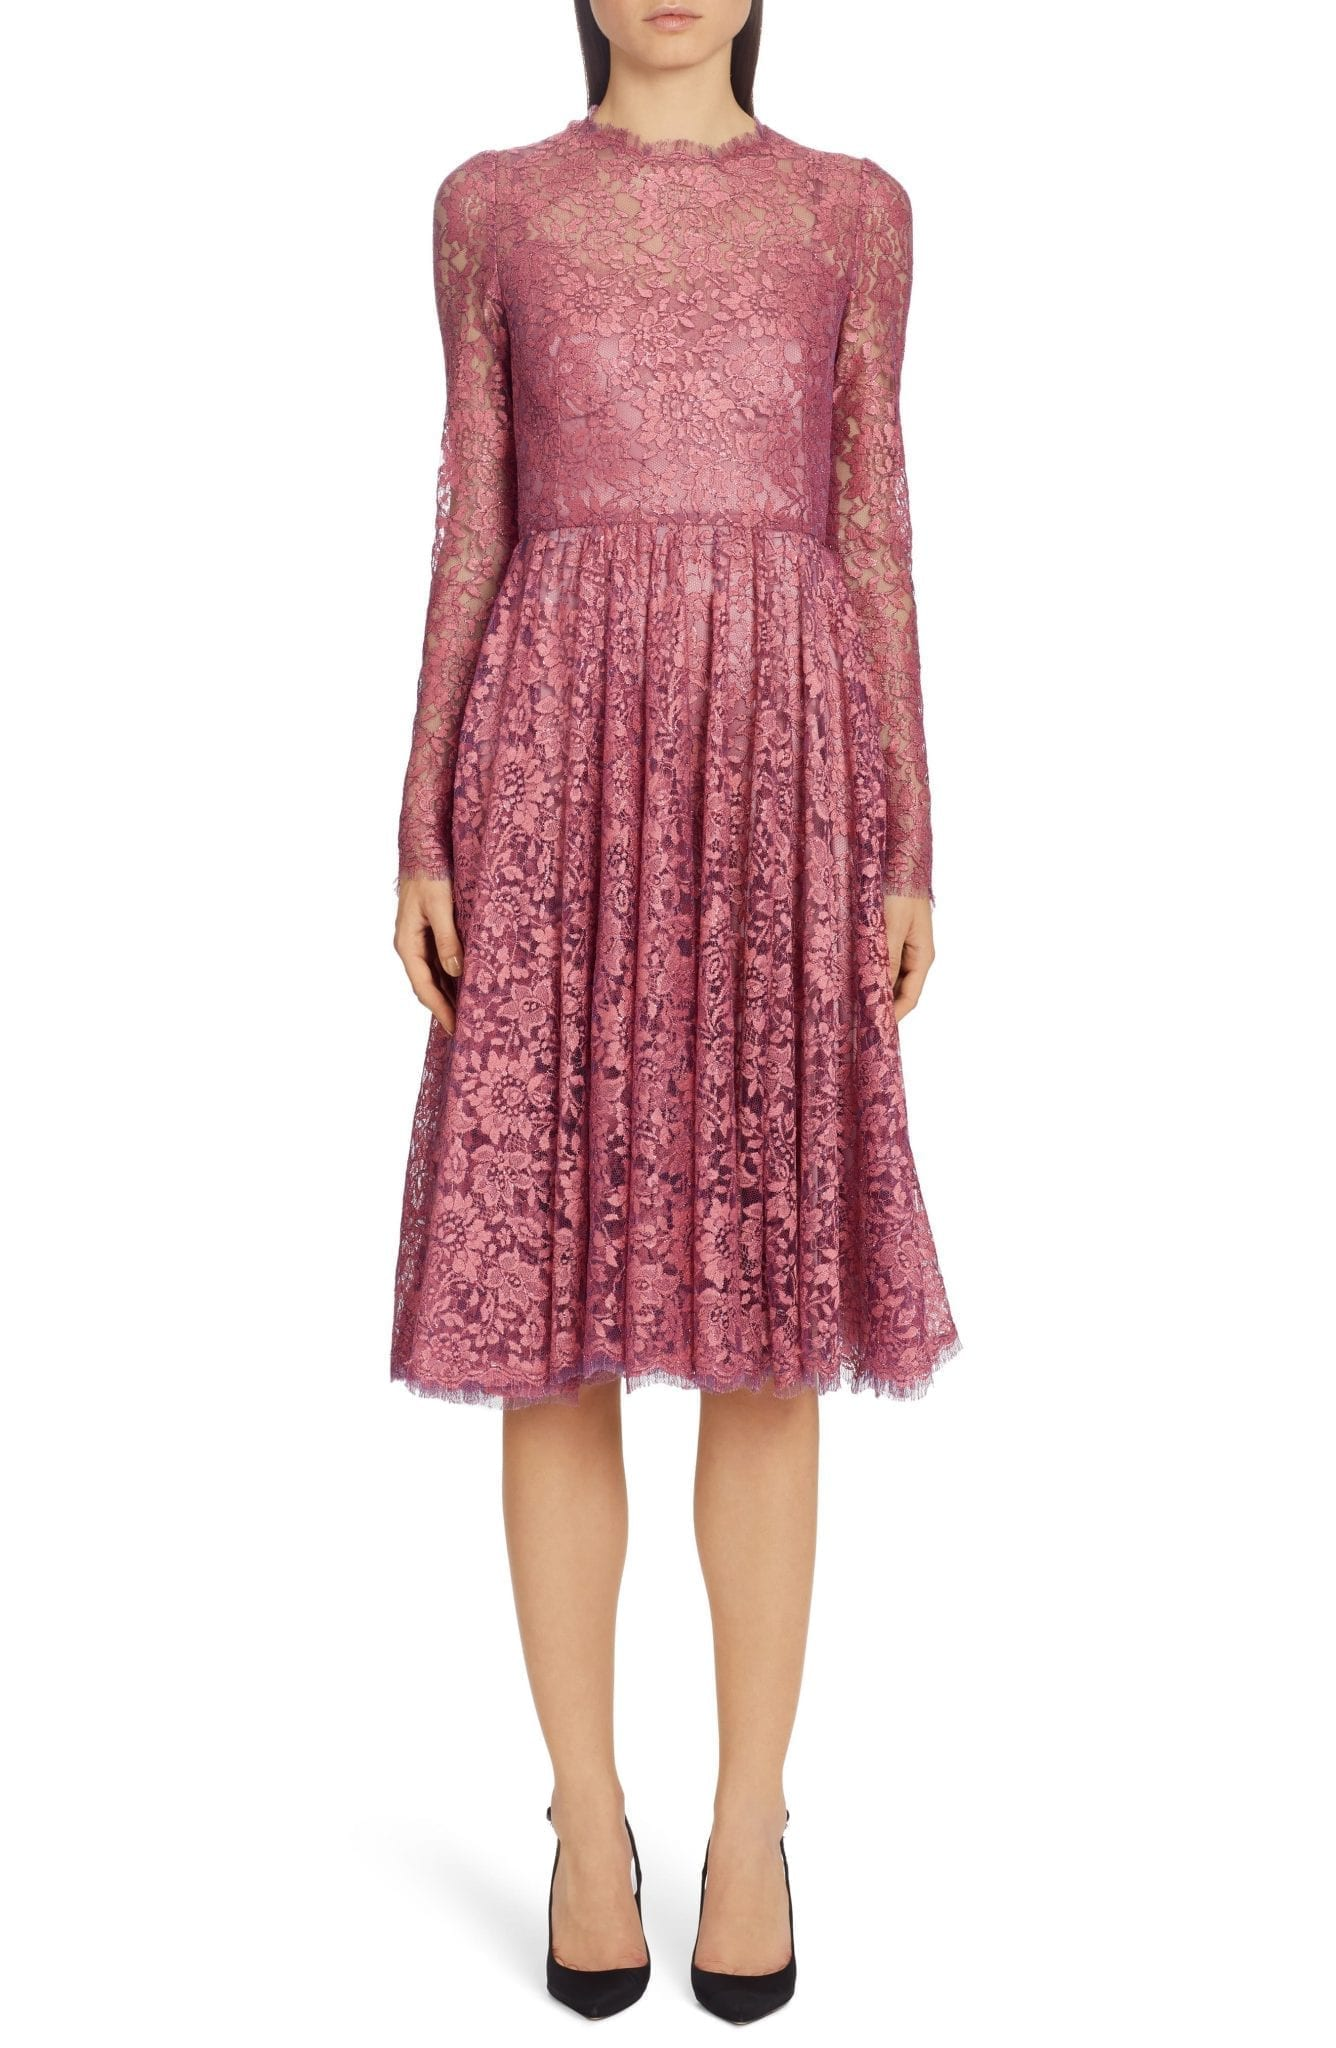 DOLCE&GABBANA Lamé Long Sleeve Chantilly Lace Dress